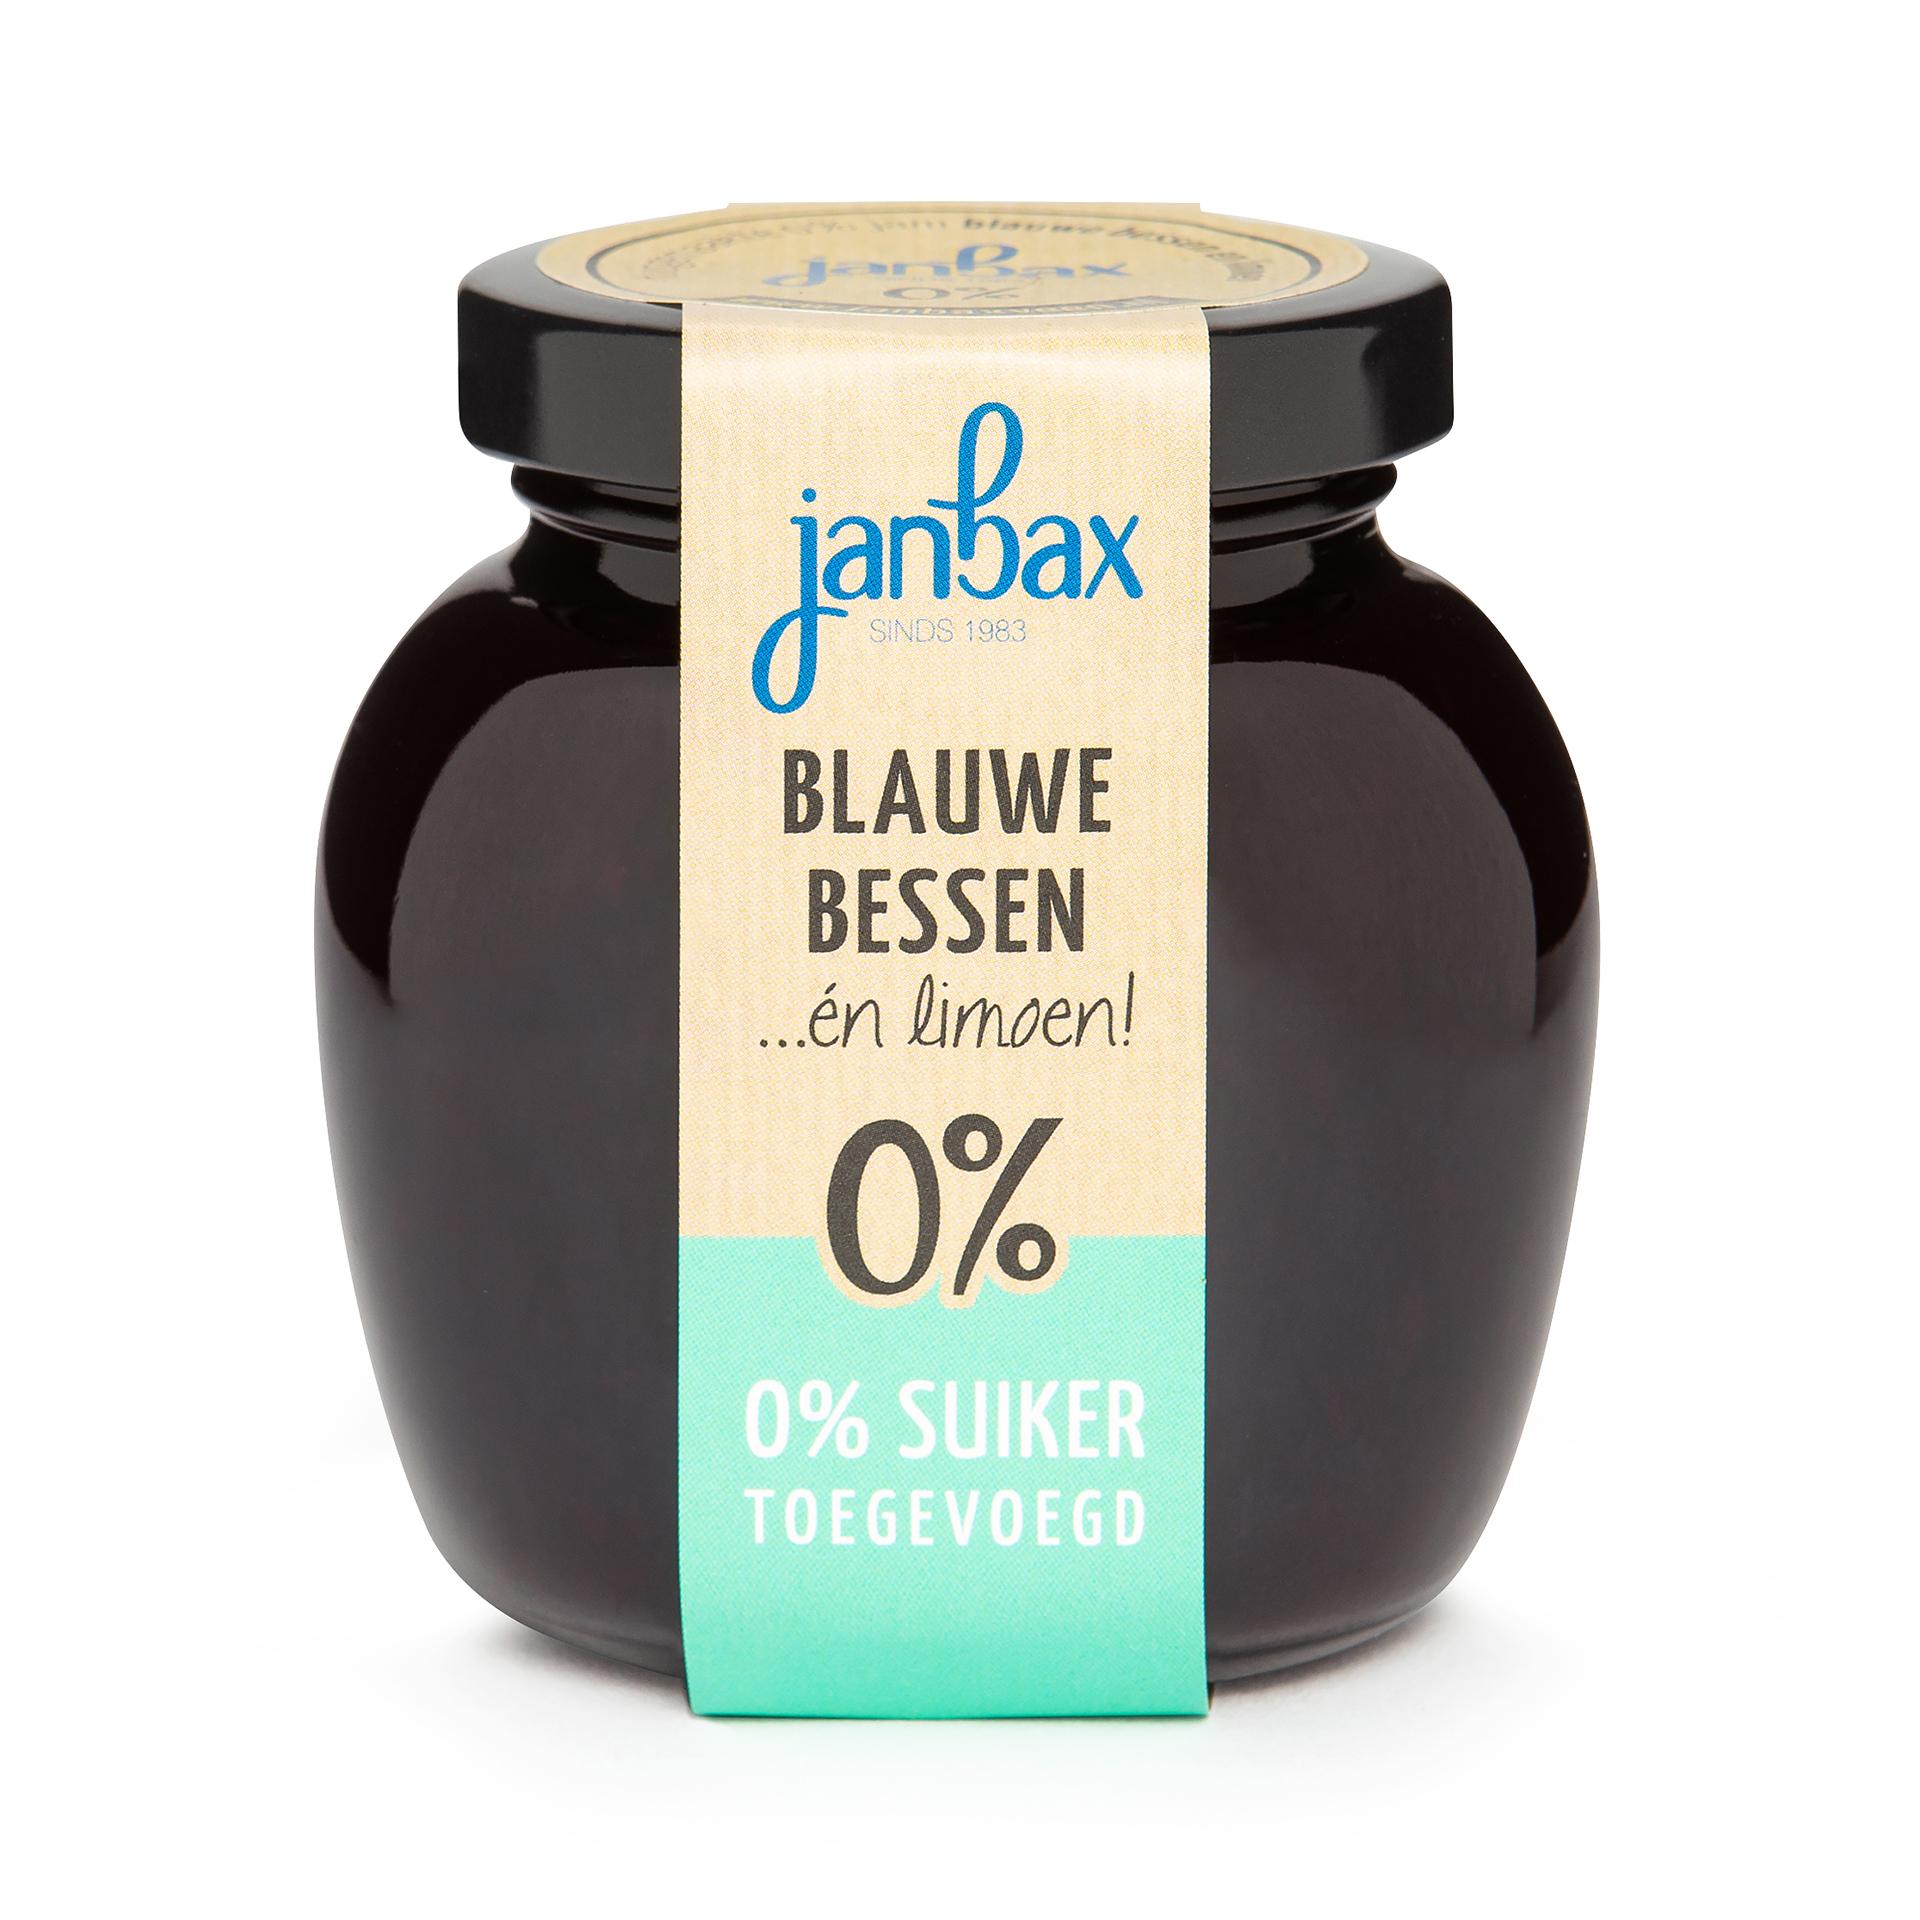 Intense 0% jam bl. bessen-limoen zonder toegevoegd suiker